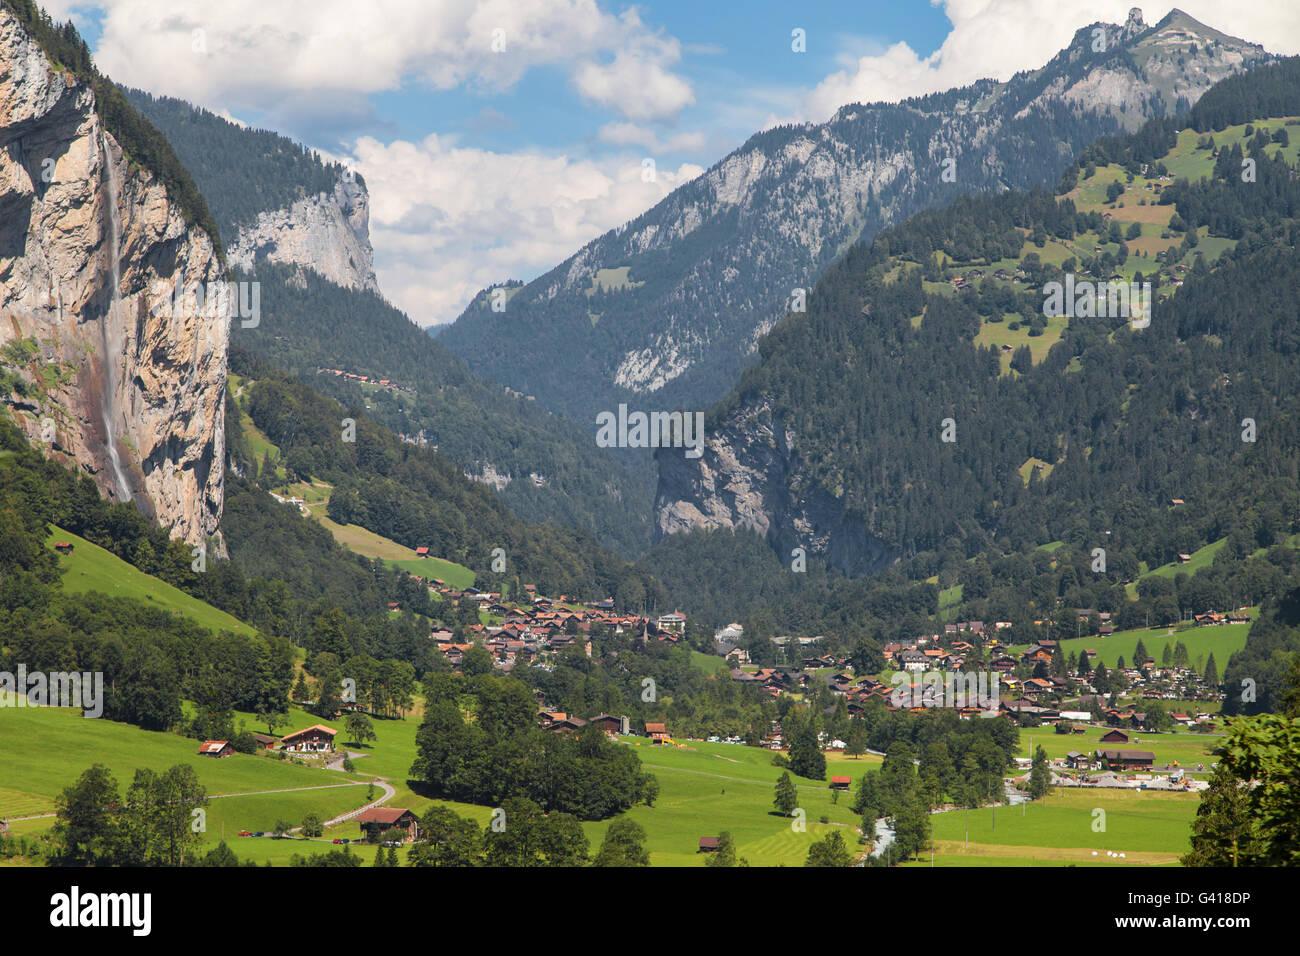 Village of Lauterbrunnen in Switzerland. - Stock Image